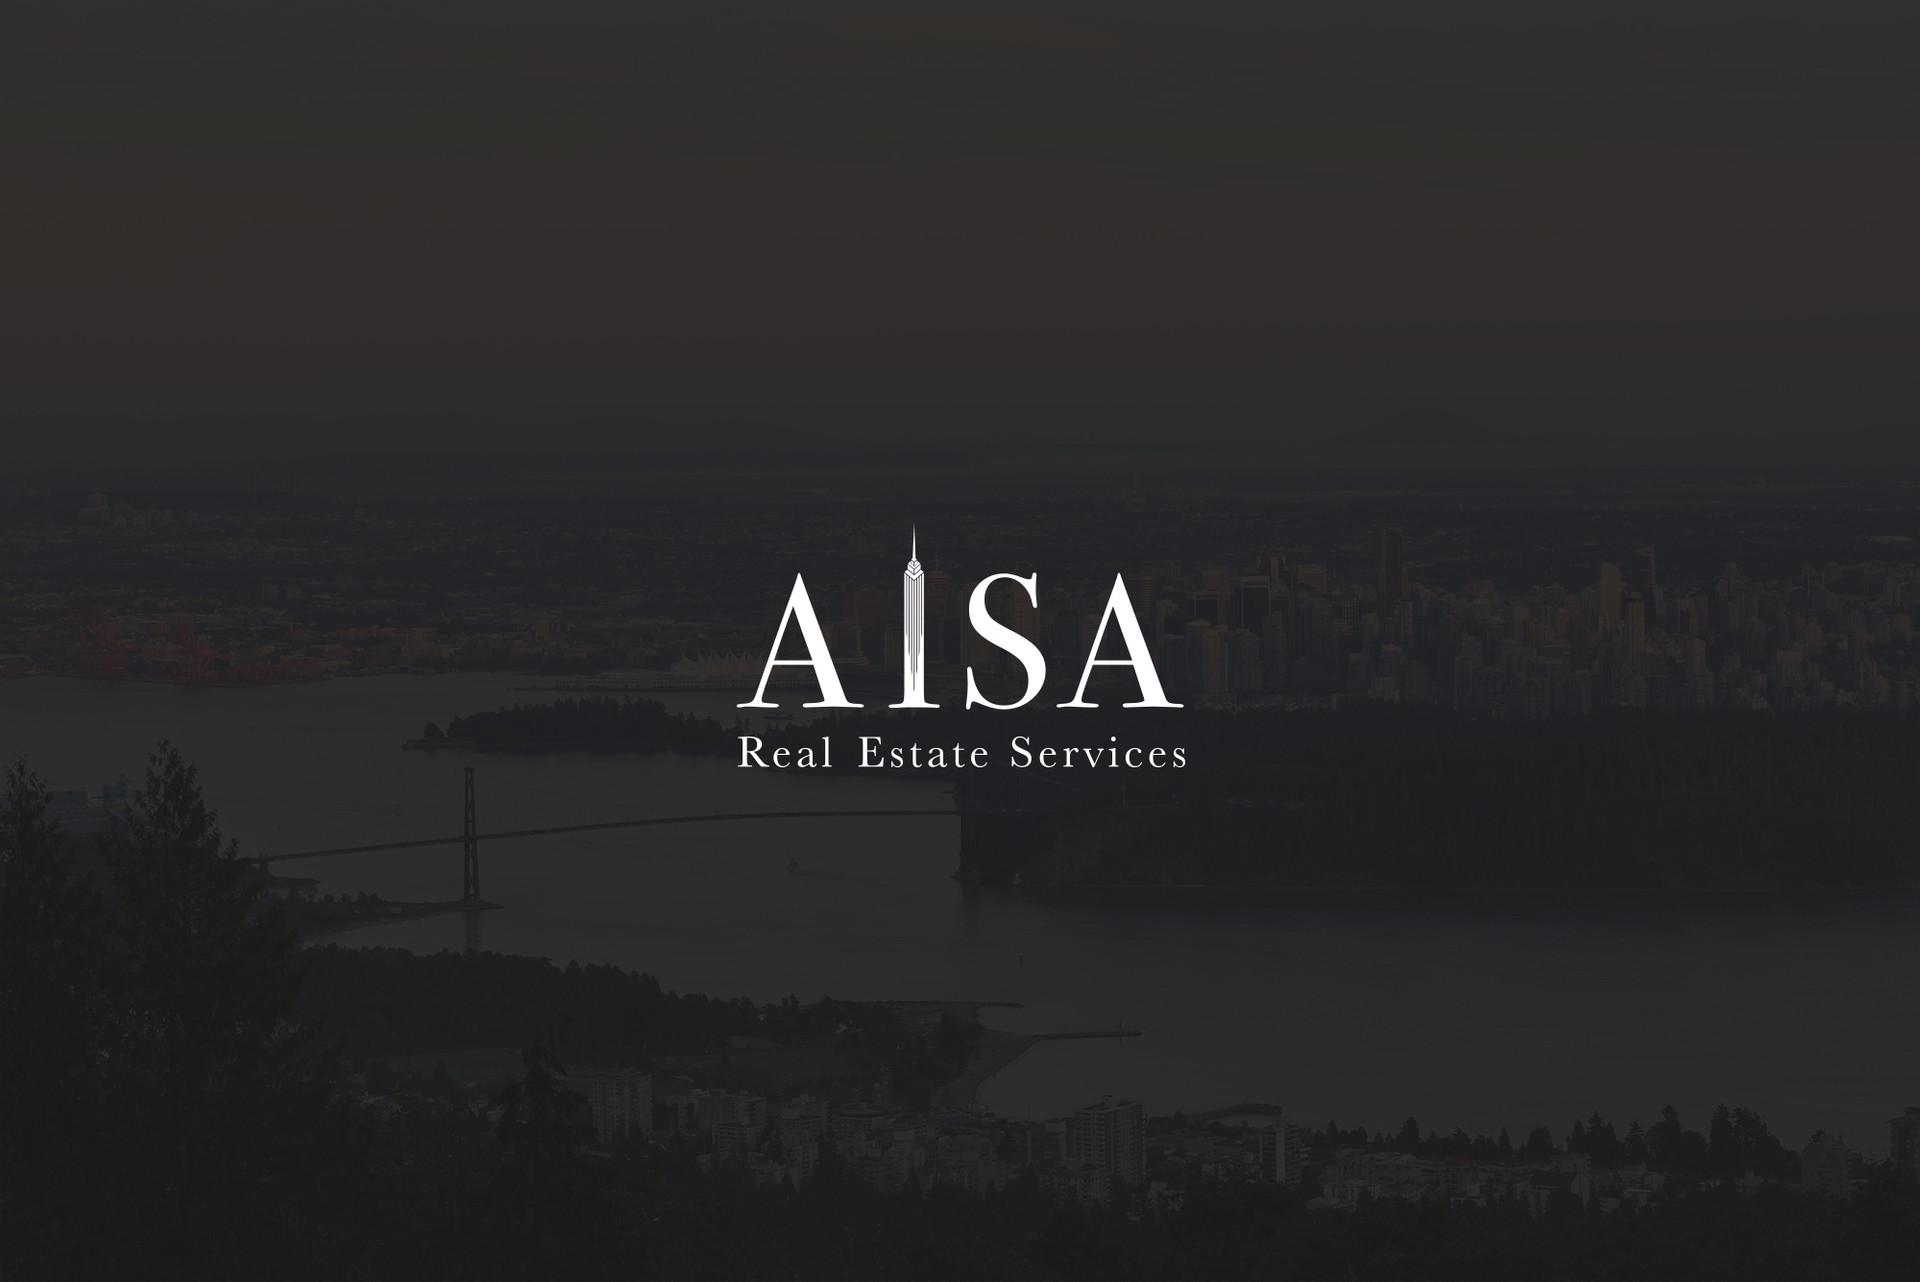 AISA Real Estate